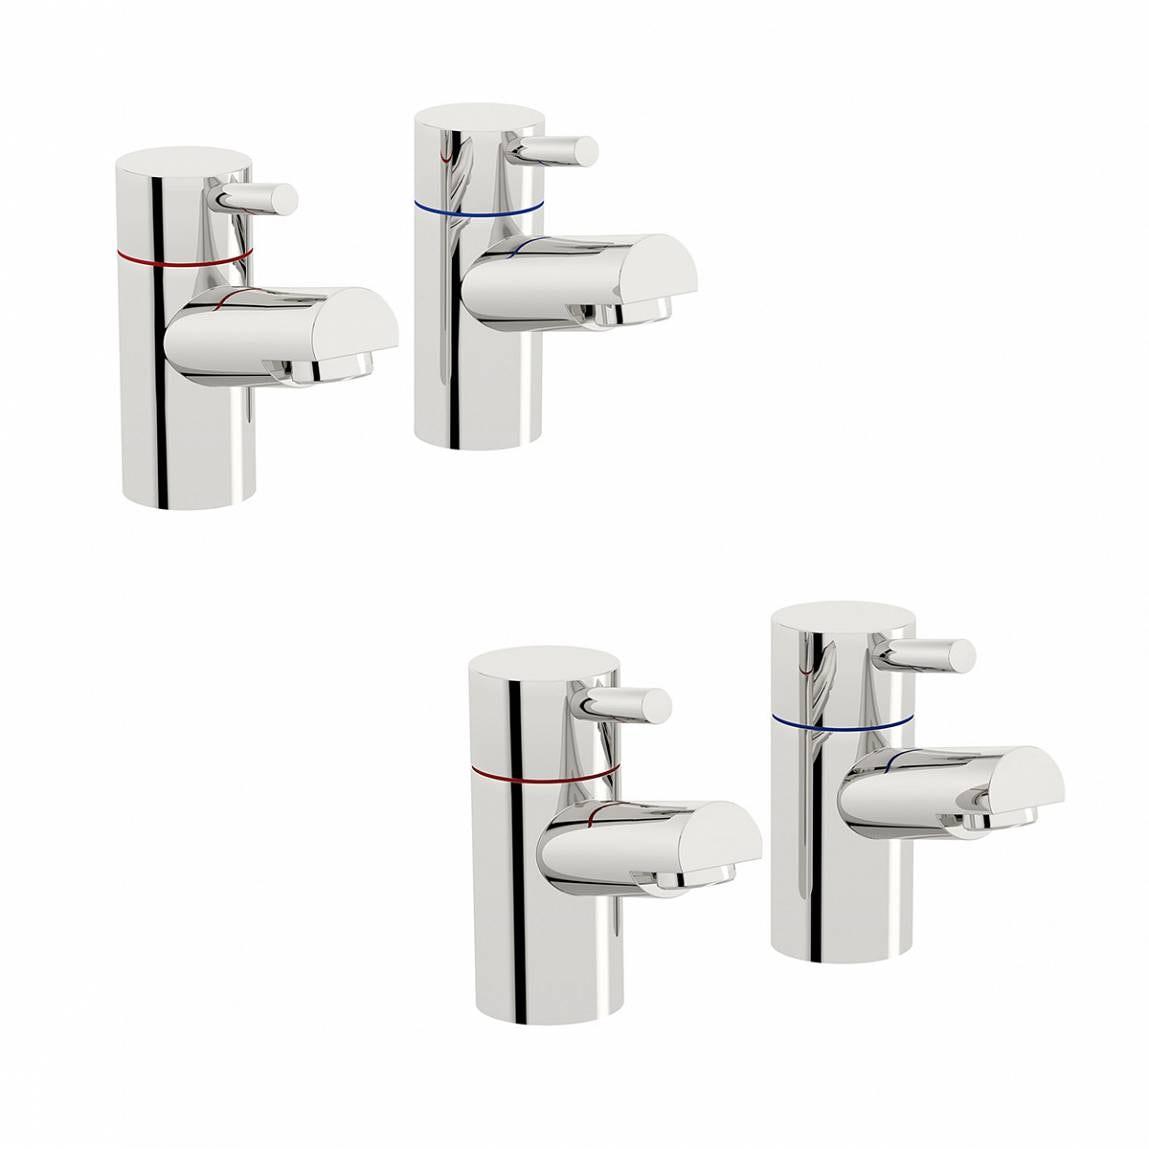 Orchard Wharfe basin and bath pillar tap pack